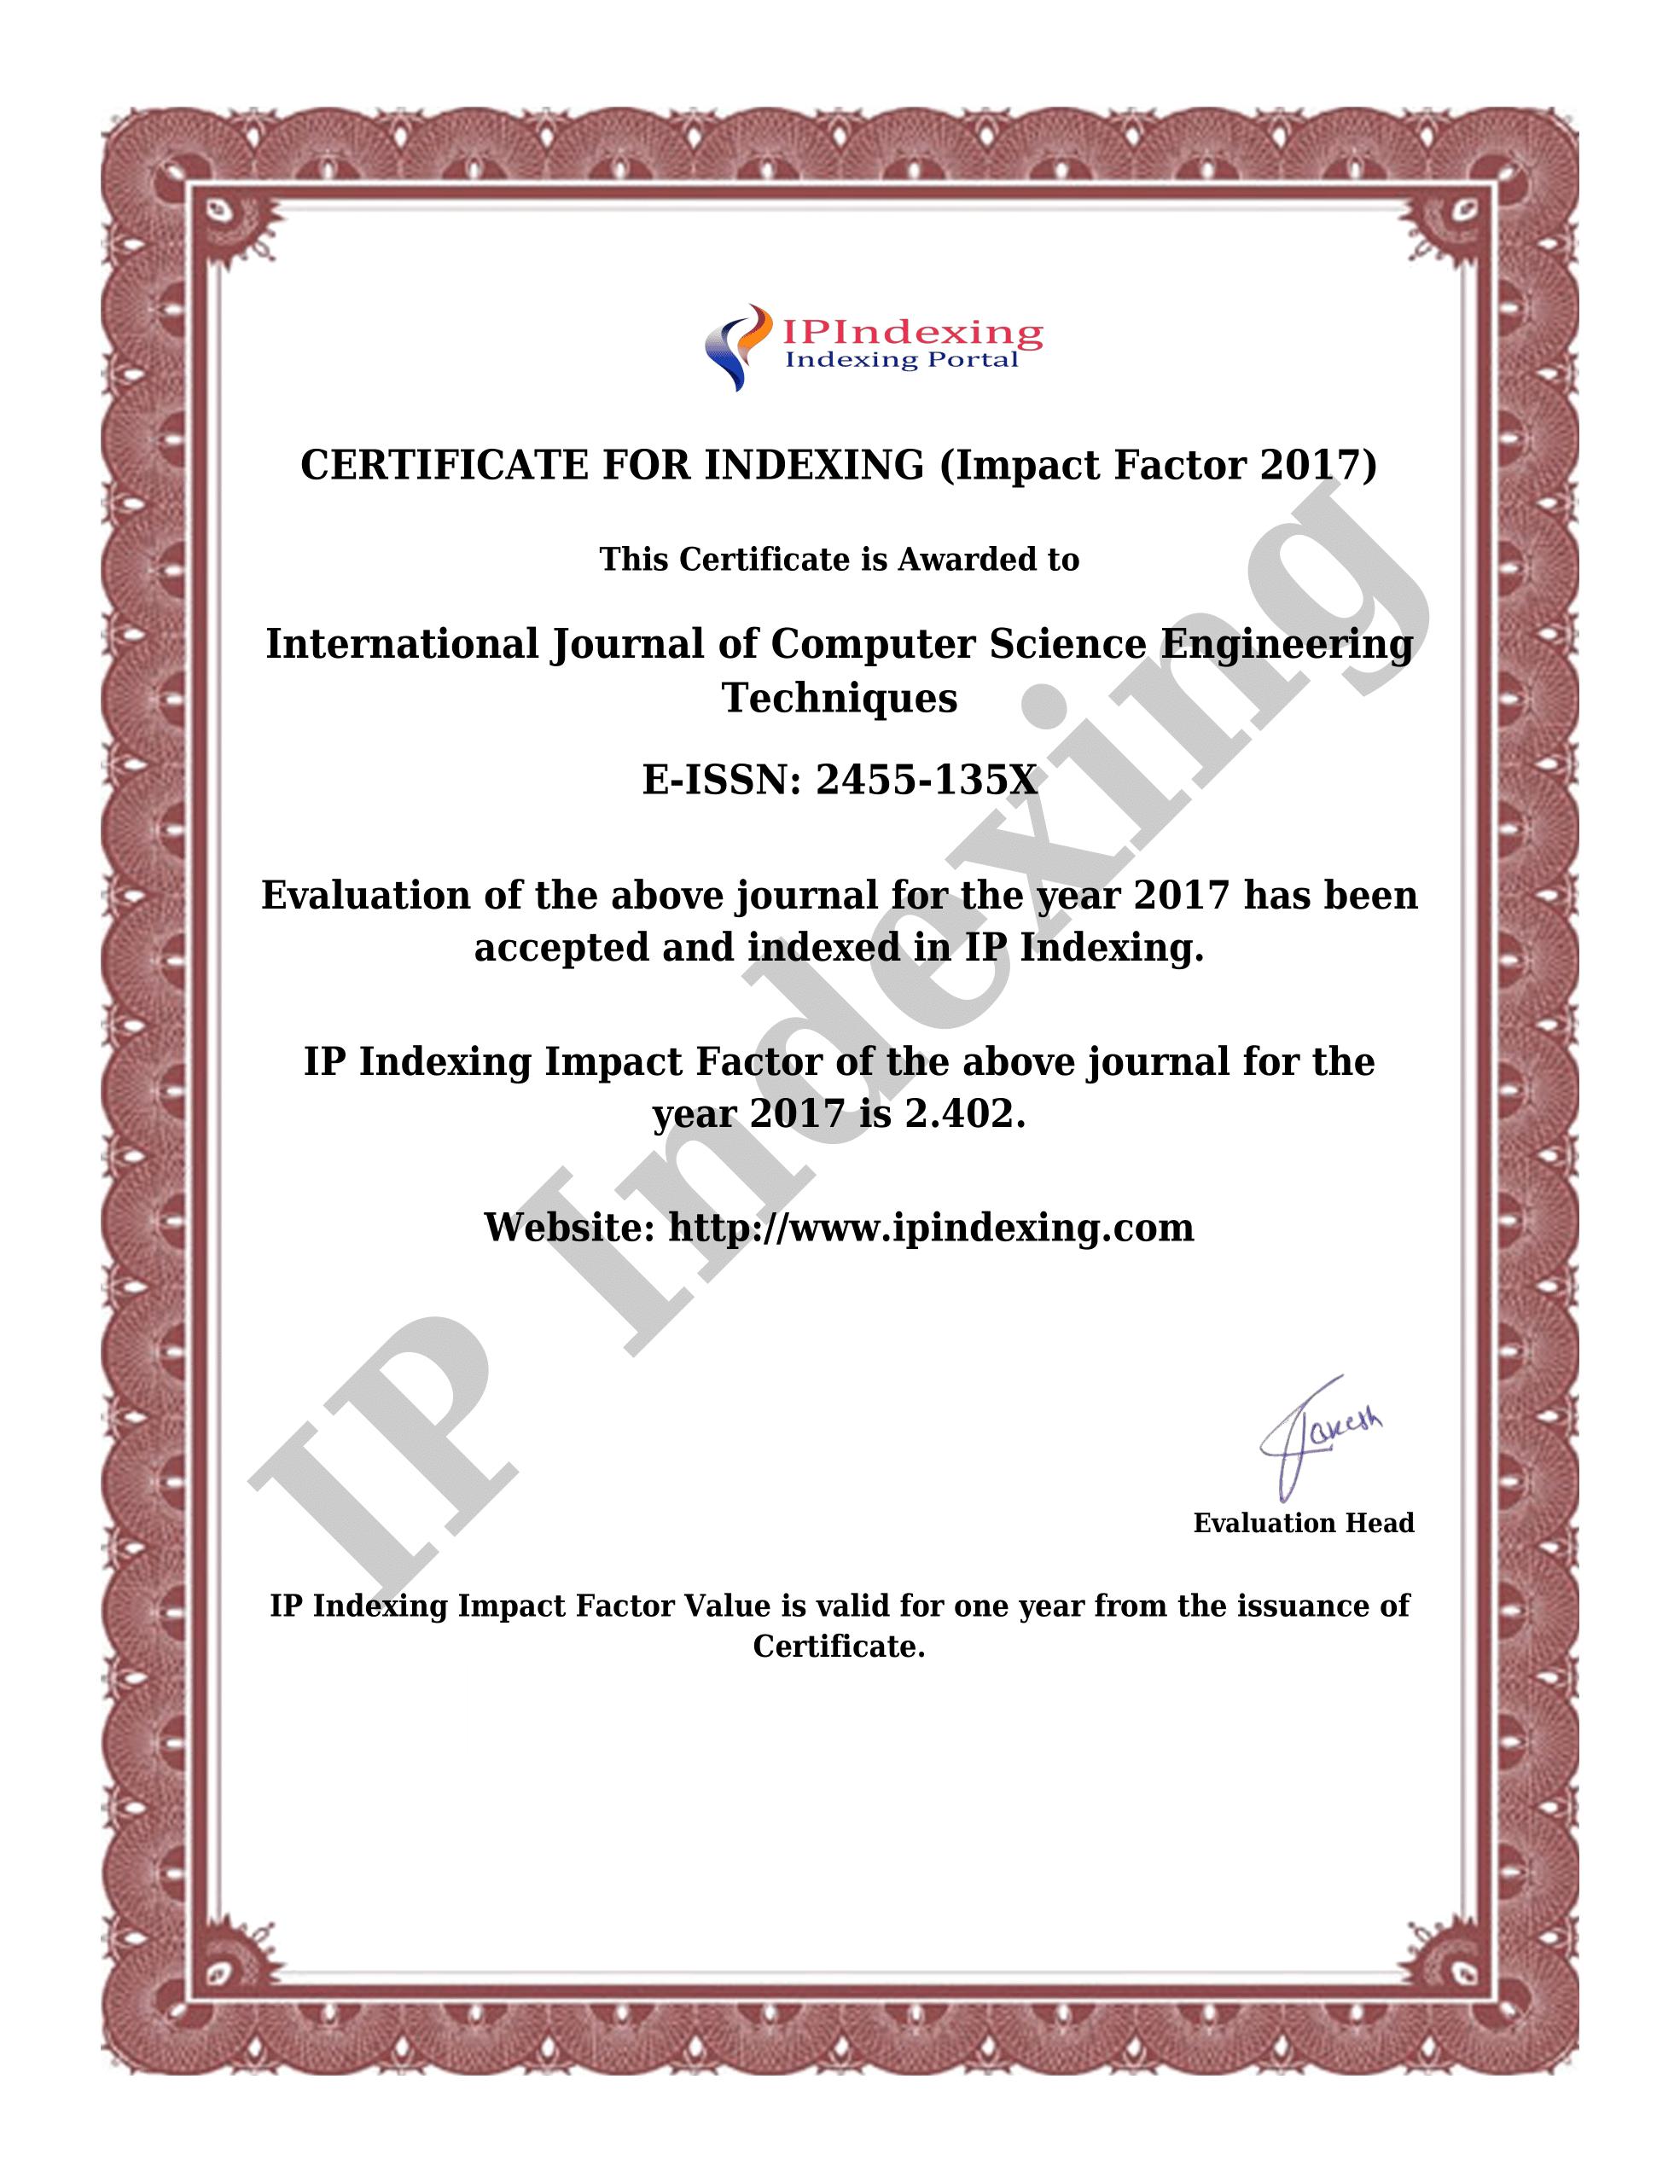 ijre-journal-isar-call-for-paper-ijcrt-ijsred-impact-factor-ipindexing